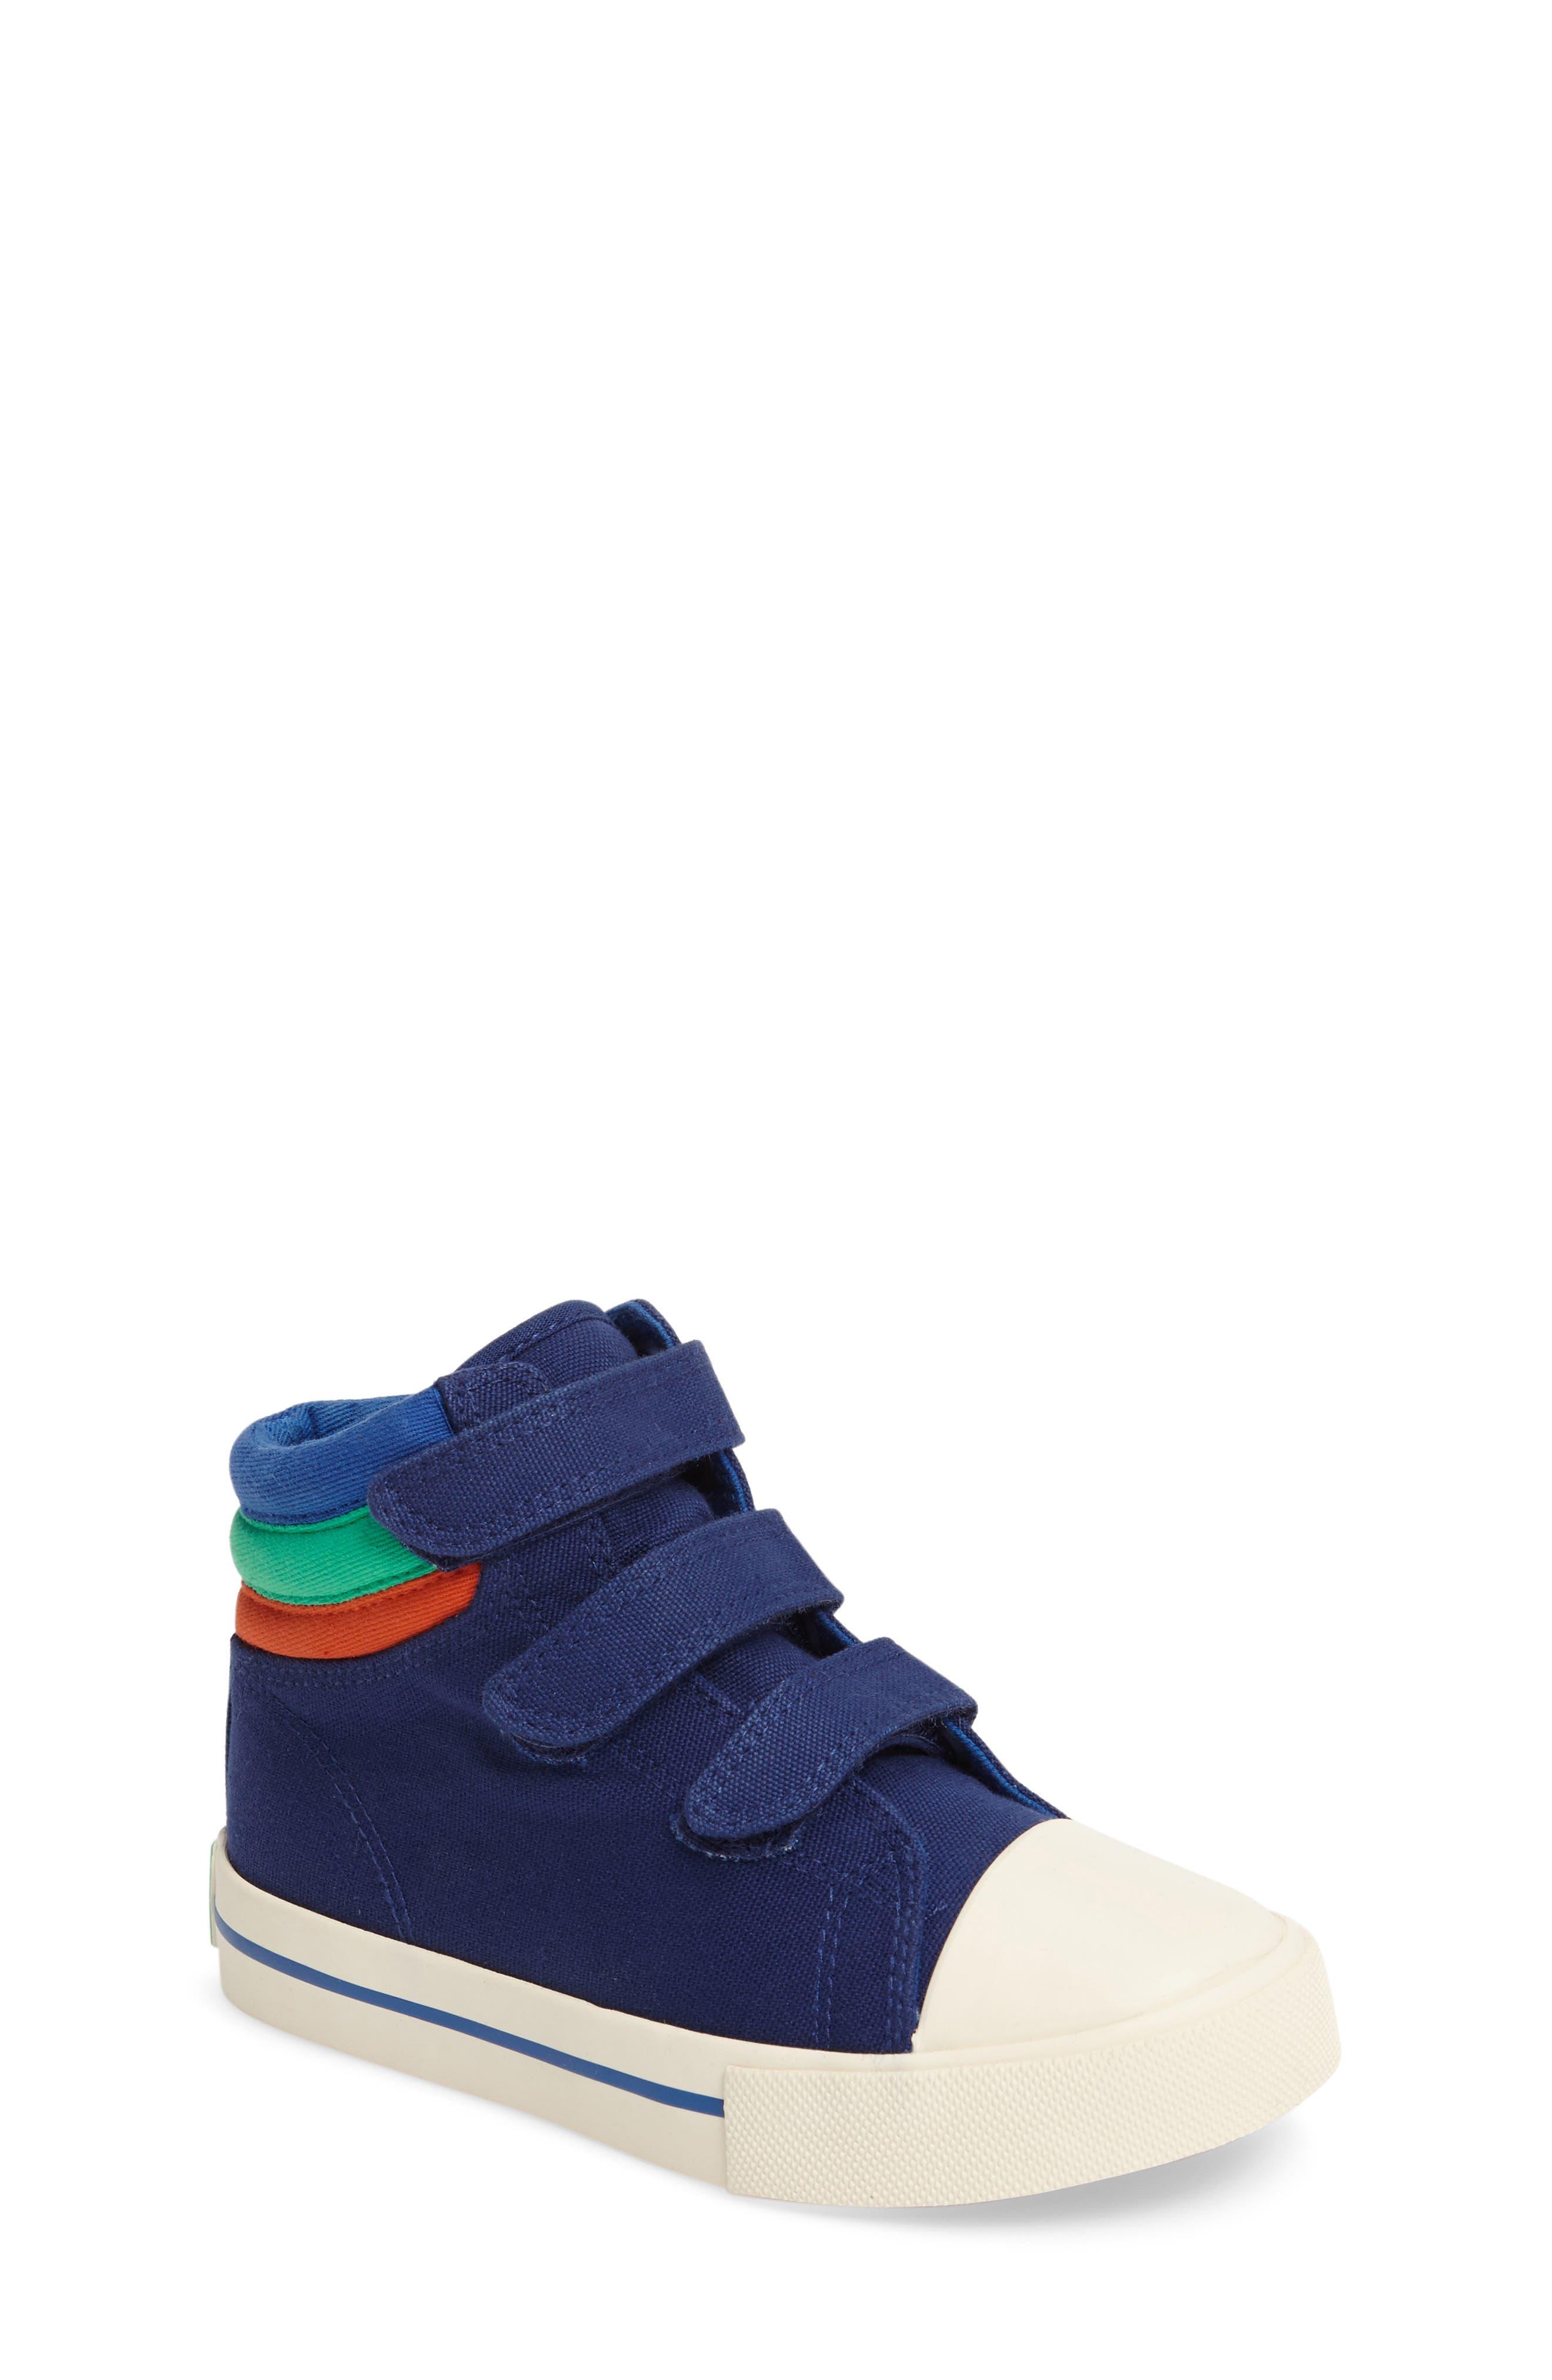 Alternate Image 1 Selected - Mini Boden High Top Sneaker (Toddler, Little Kid & Big Kid)